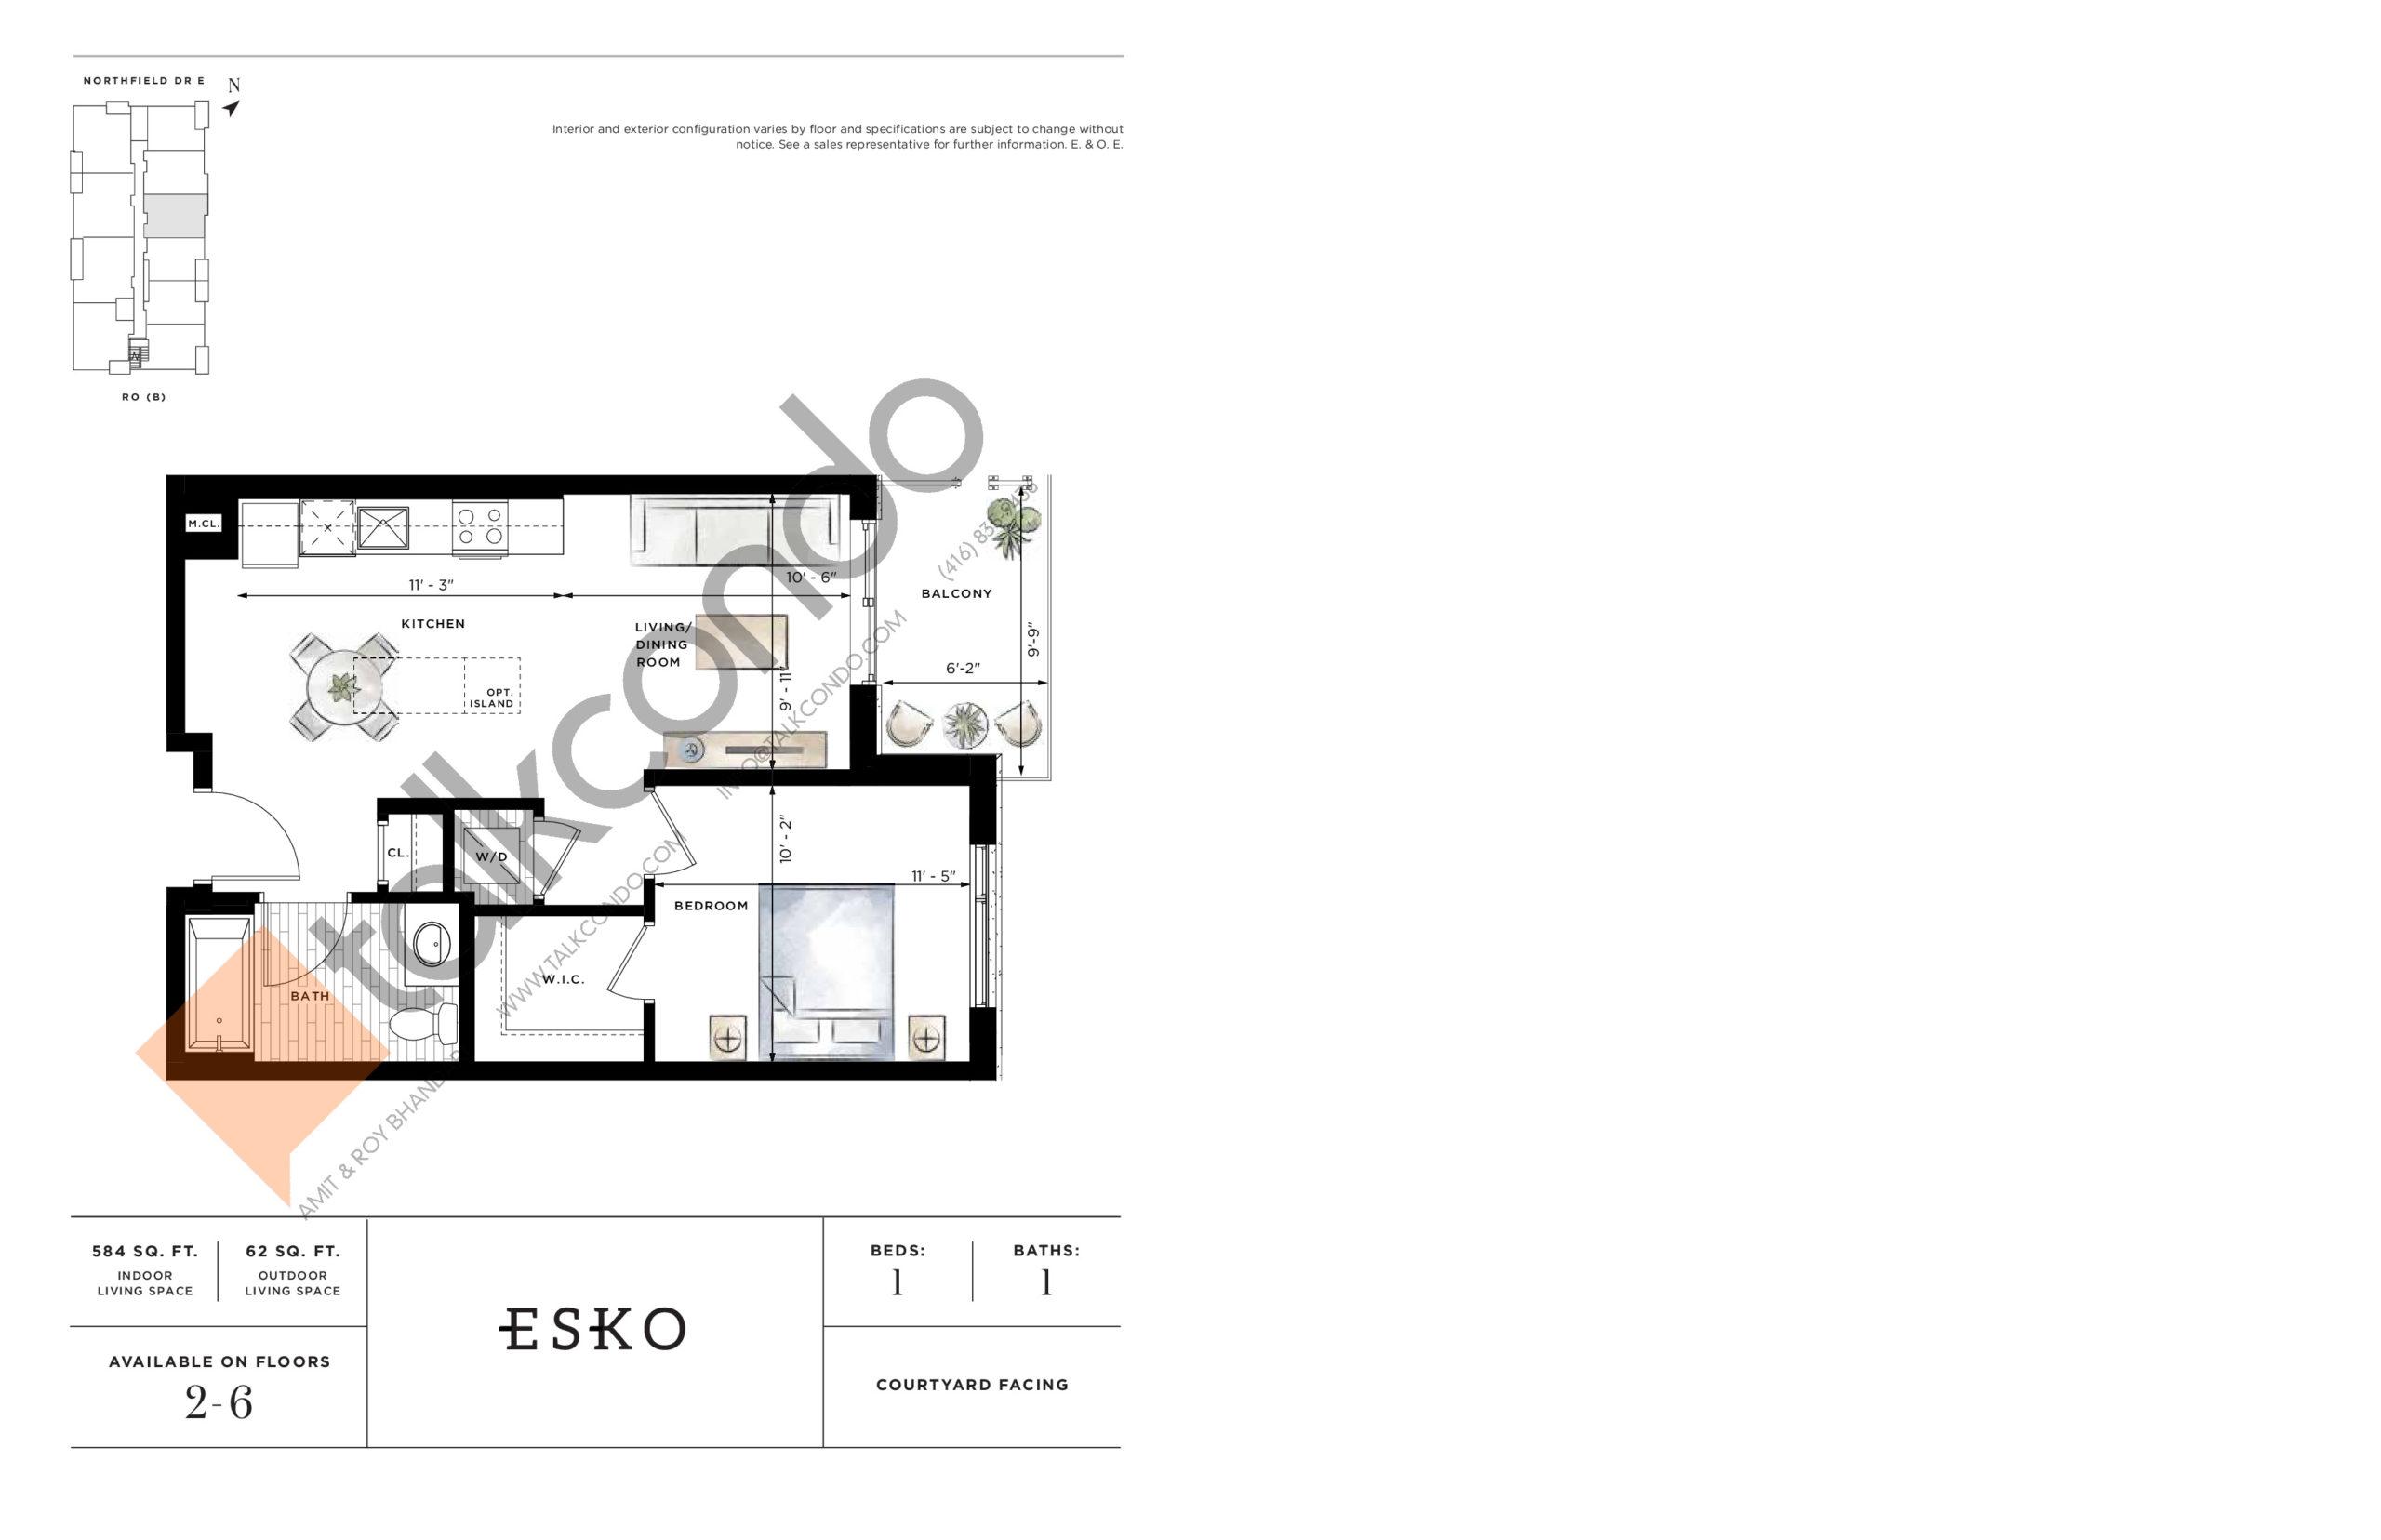 Esko Floor Plan at Ro at Blackstone Condos - 584 sq.ft